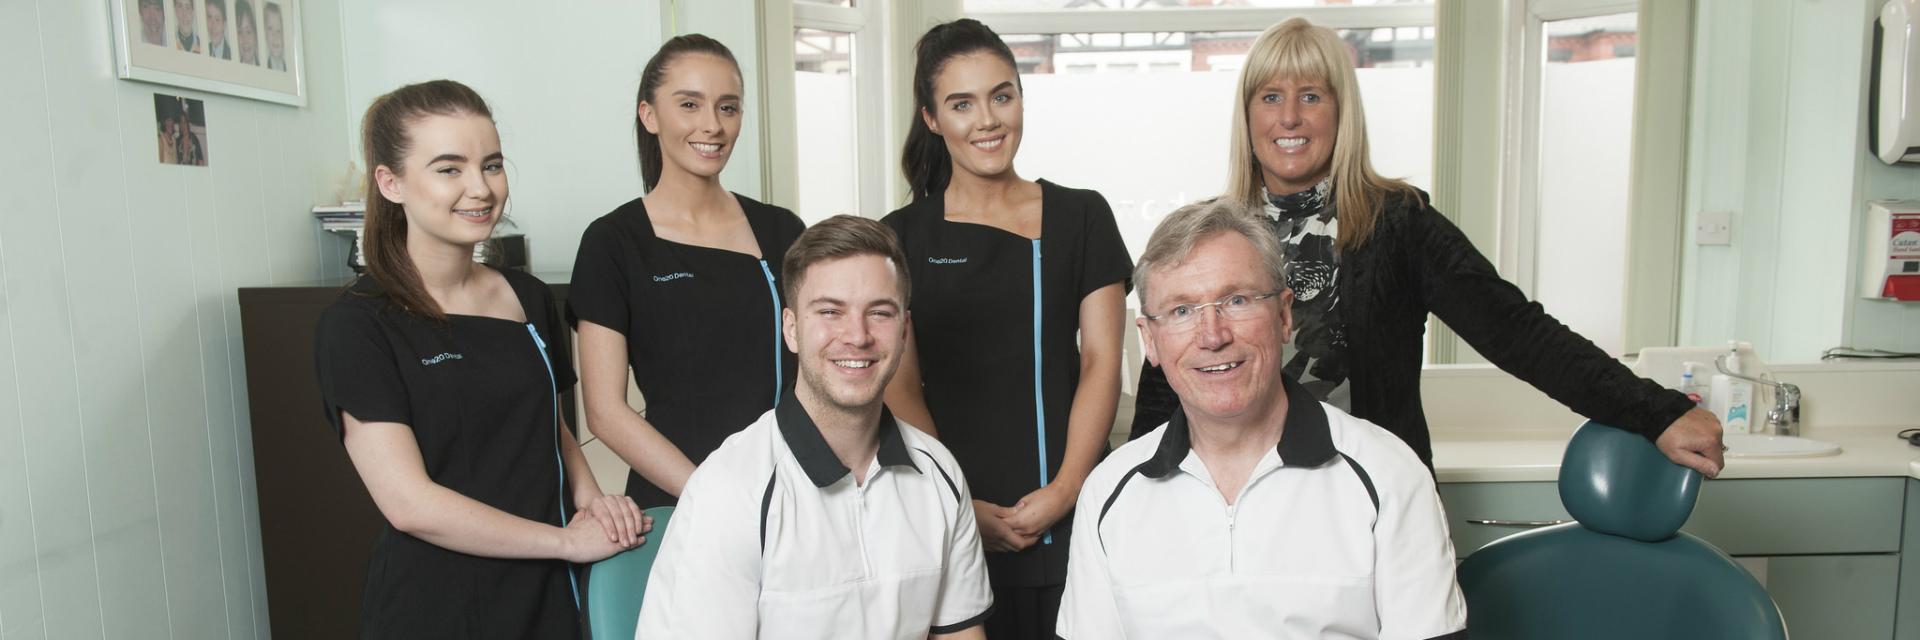 Dentist in Liverpool Merseyside